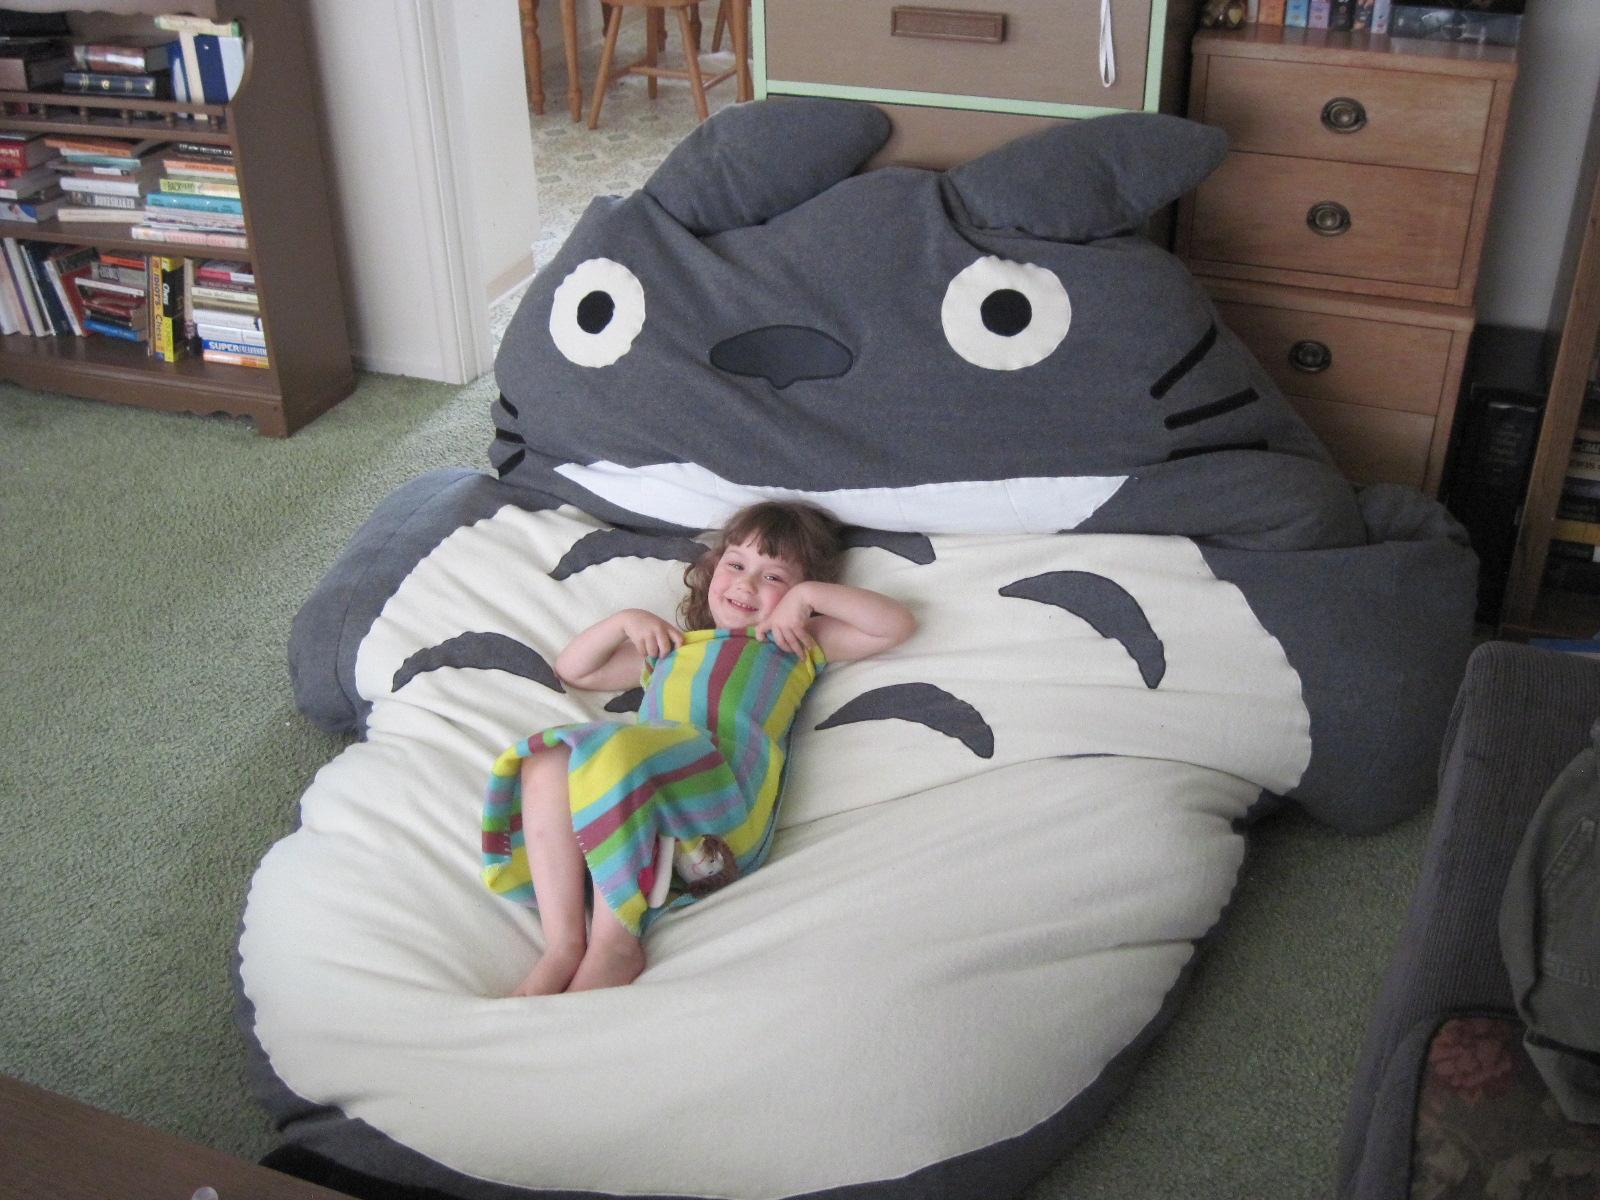 Anime Bean Bag Chair Swivel Gumtree Glasgow Chaos To Art Totoro